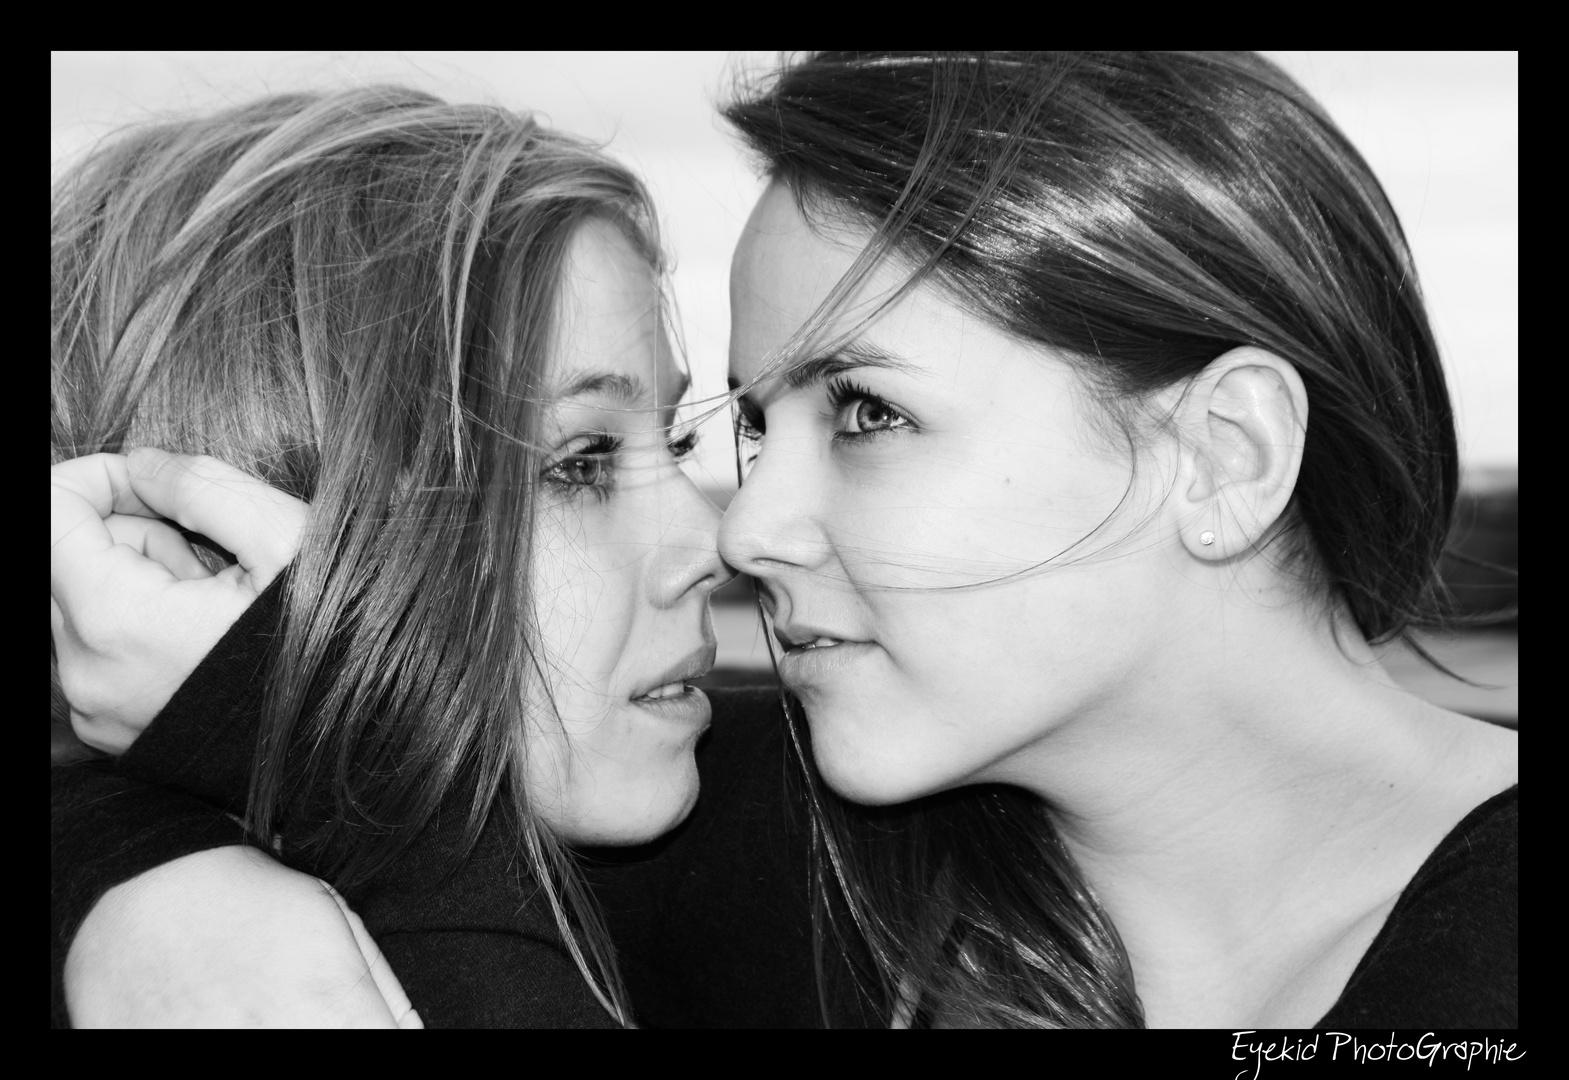 Alicia & Pauline - Eyekid